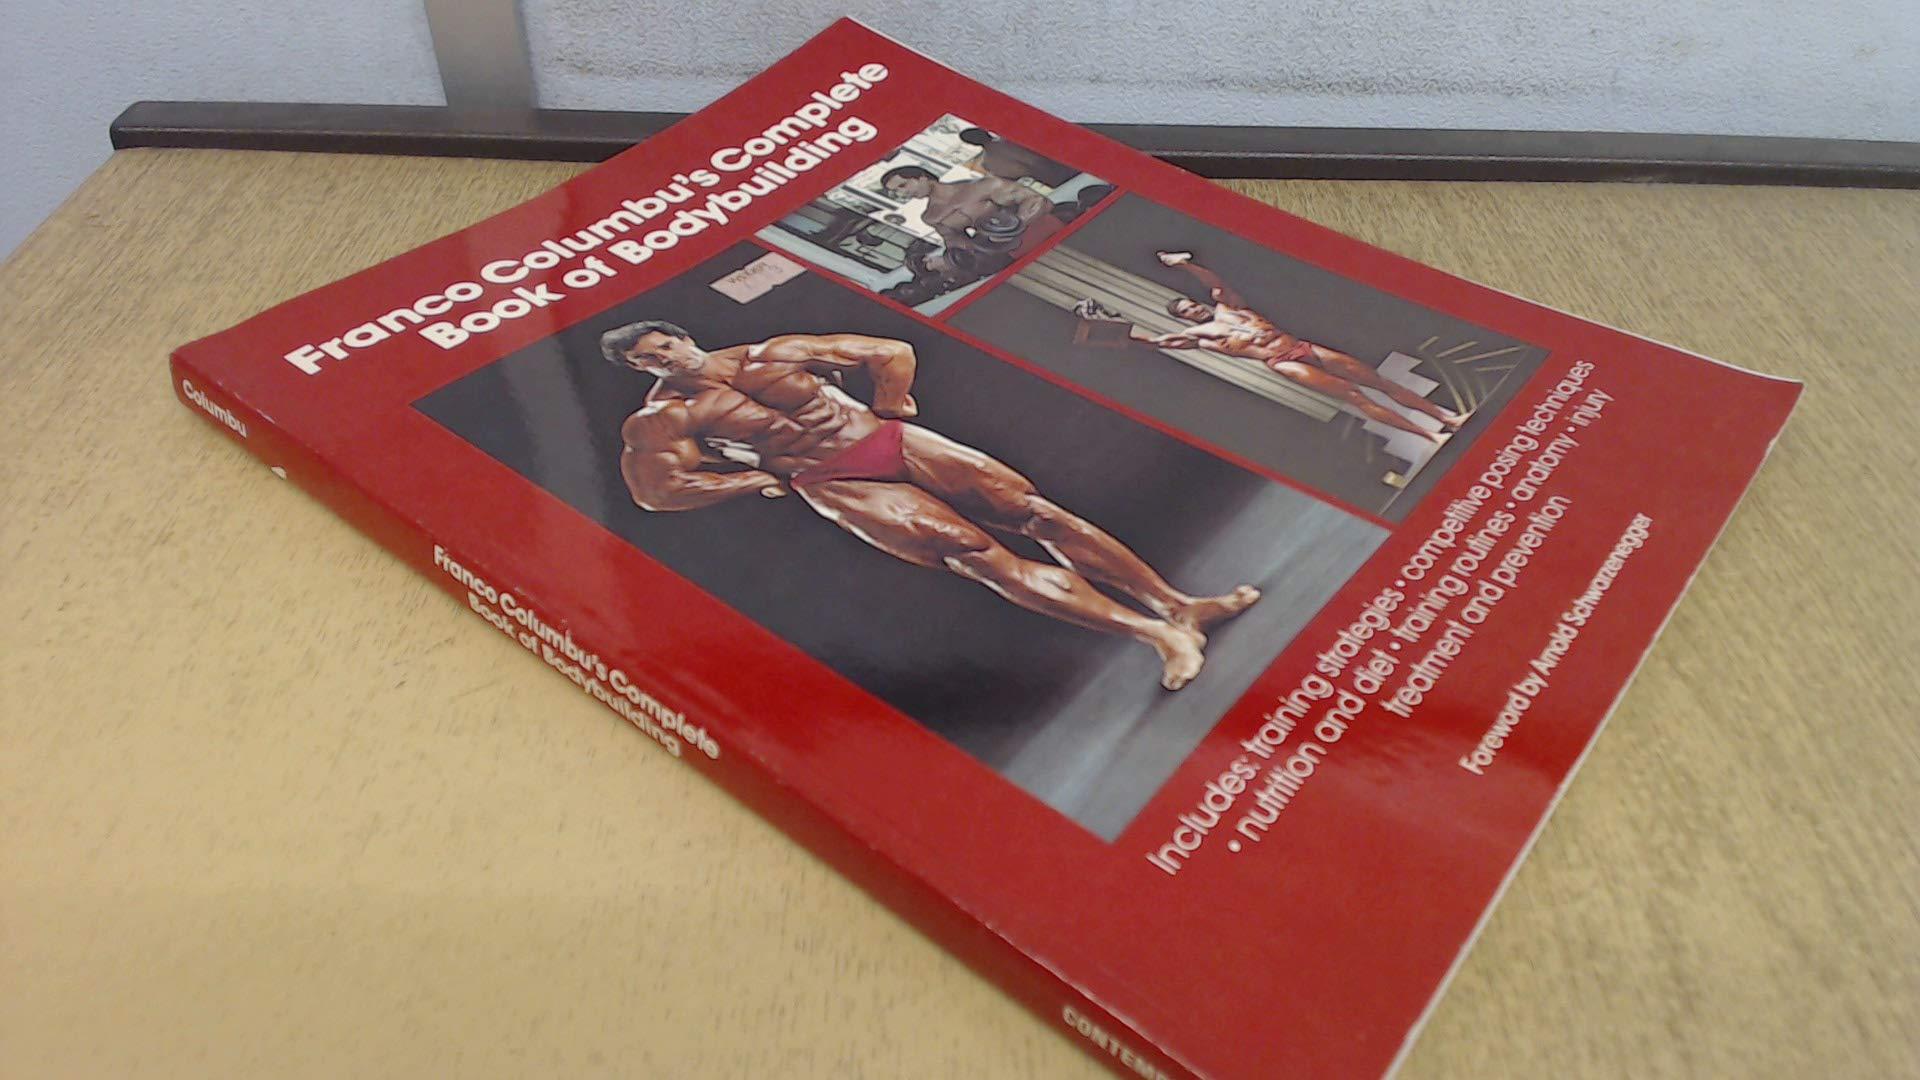 Franco Columbus Complete Book Of Bodybuilding